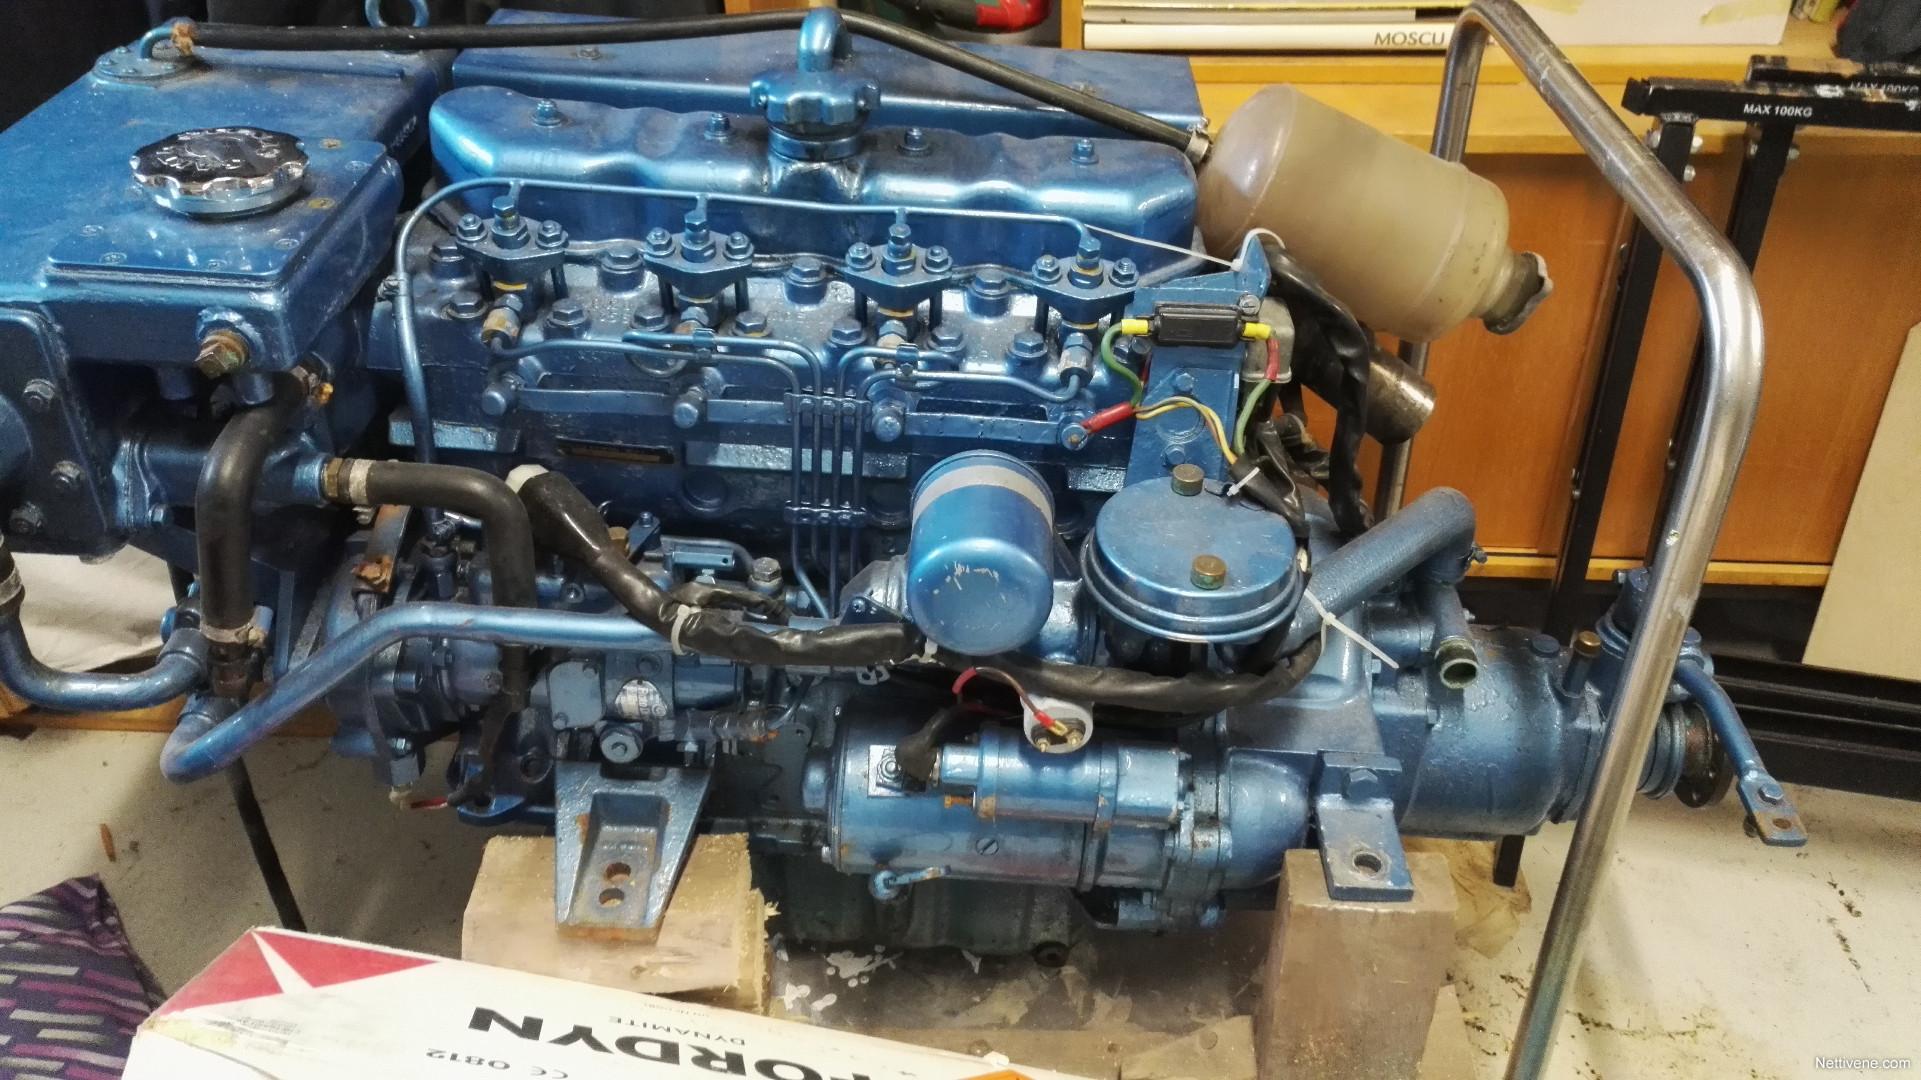 Md21a Manual Volvo Penta Aq130c Engine Diagram Page 1 Array Gear Rh Signaturepedagogies Org Uk